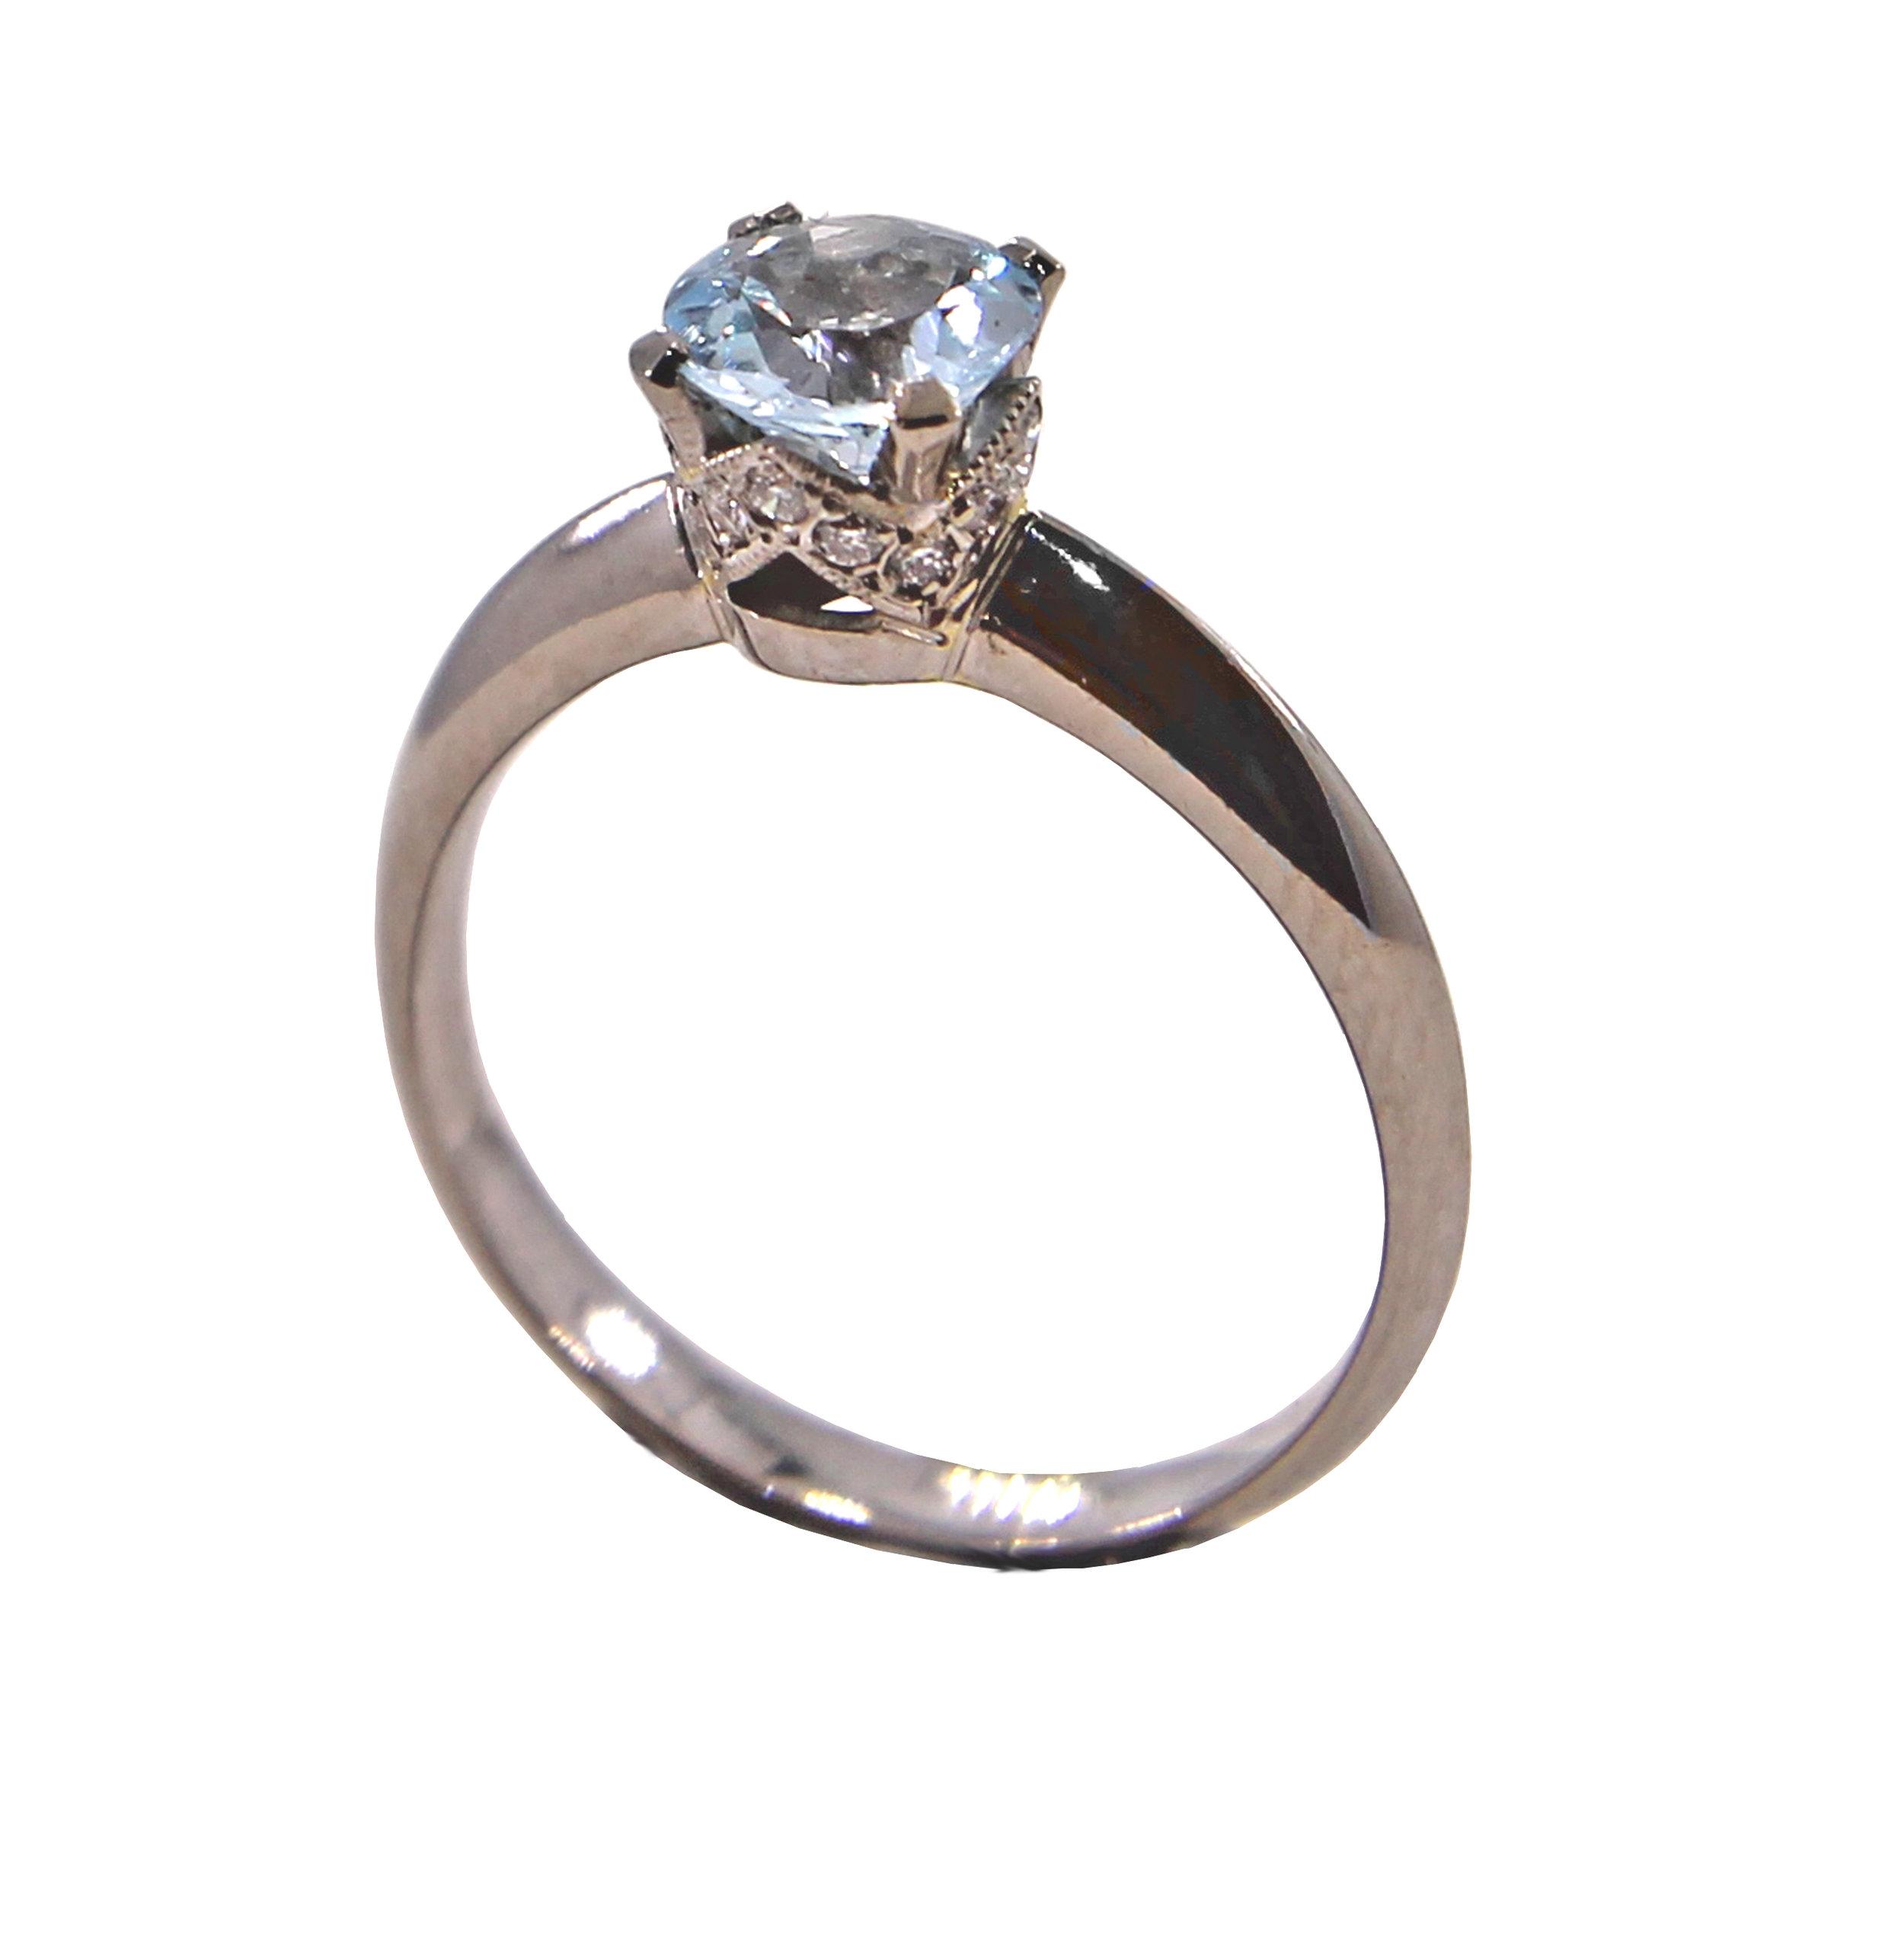 "Aquamarine Solitaire with Diamond ""Crown"" Setting"